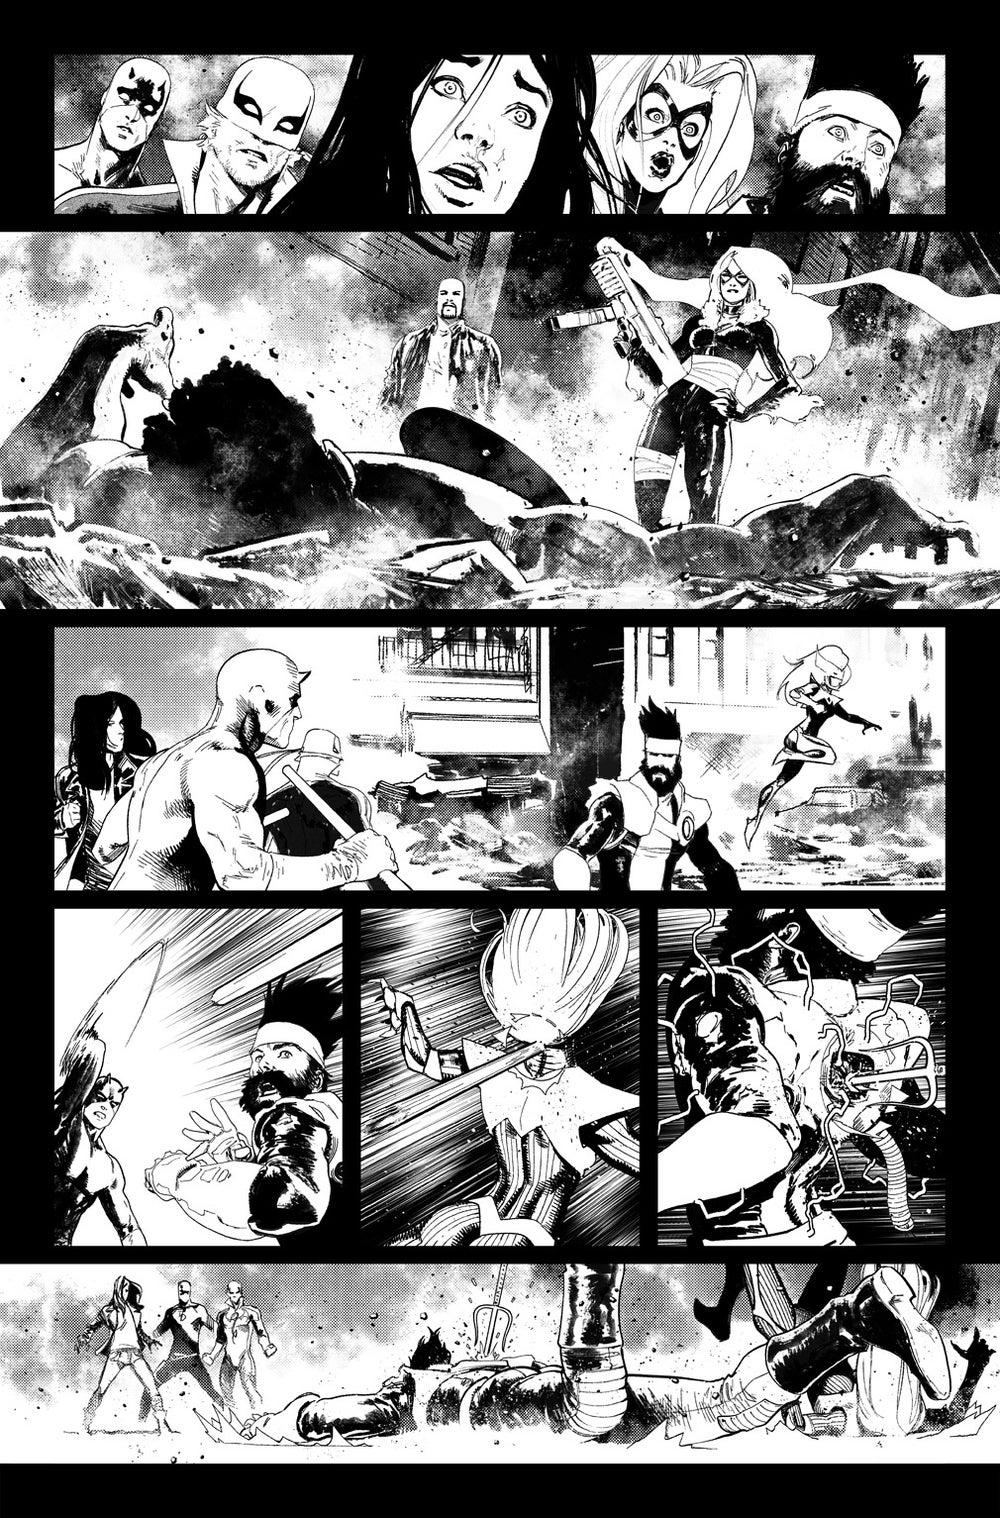 Image of DEFENDERS #9, p.19 ARTIST'S PROOF